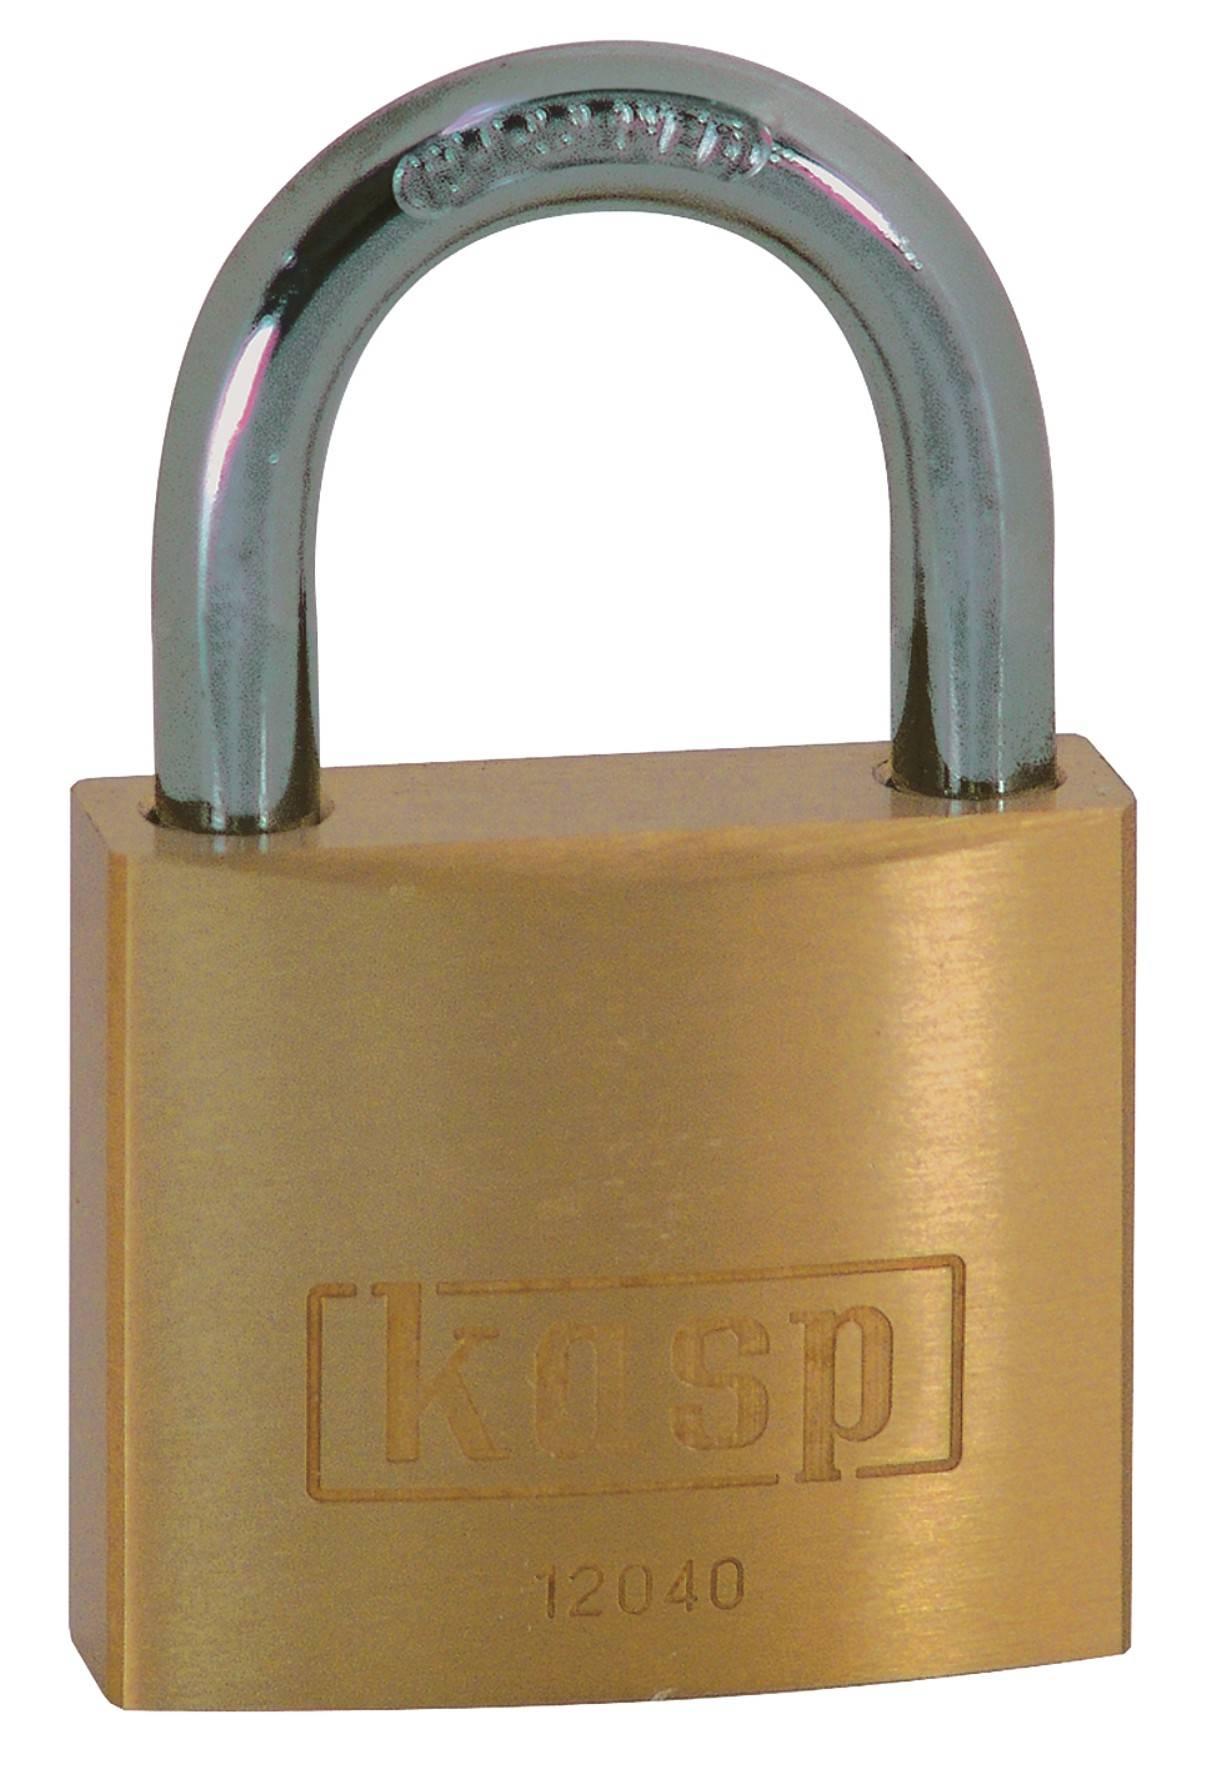 Visiaci zámok na kľúč Kasp K12030A1, 30 mm, zlatožltá